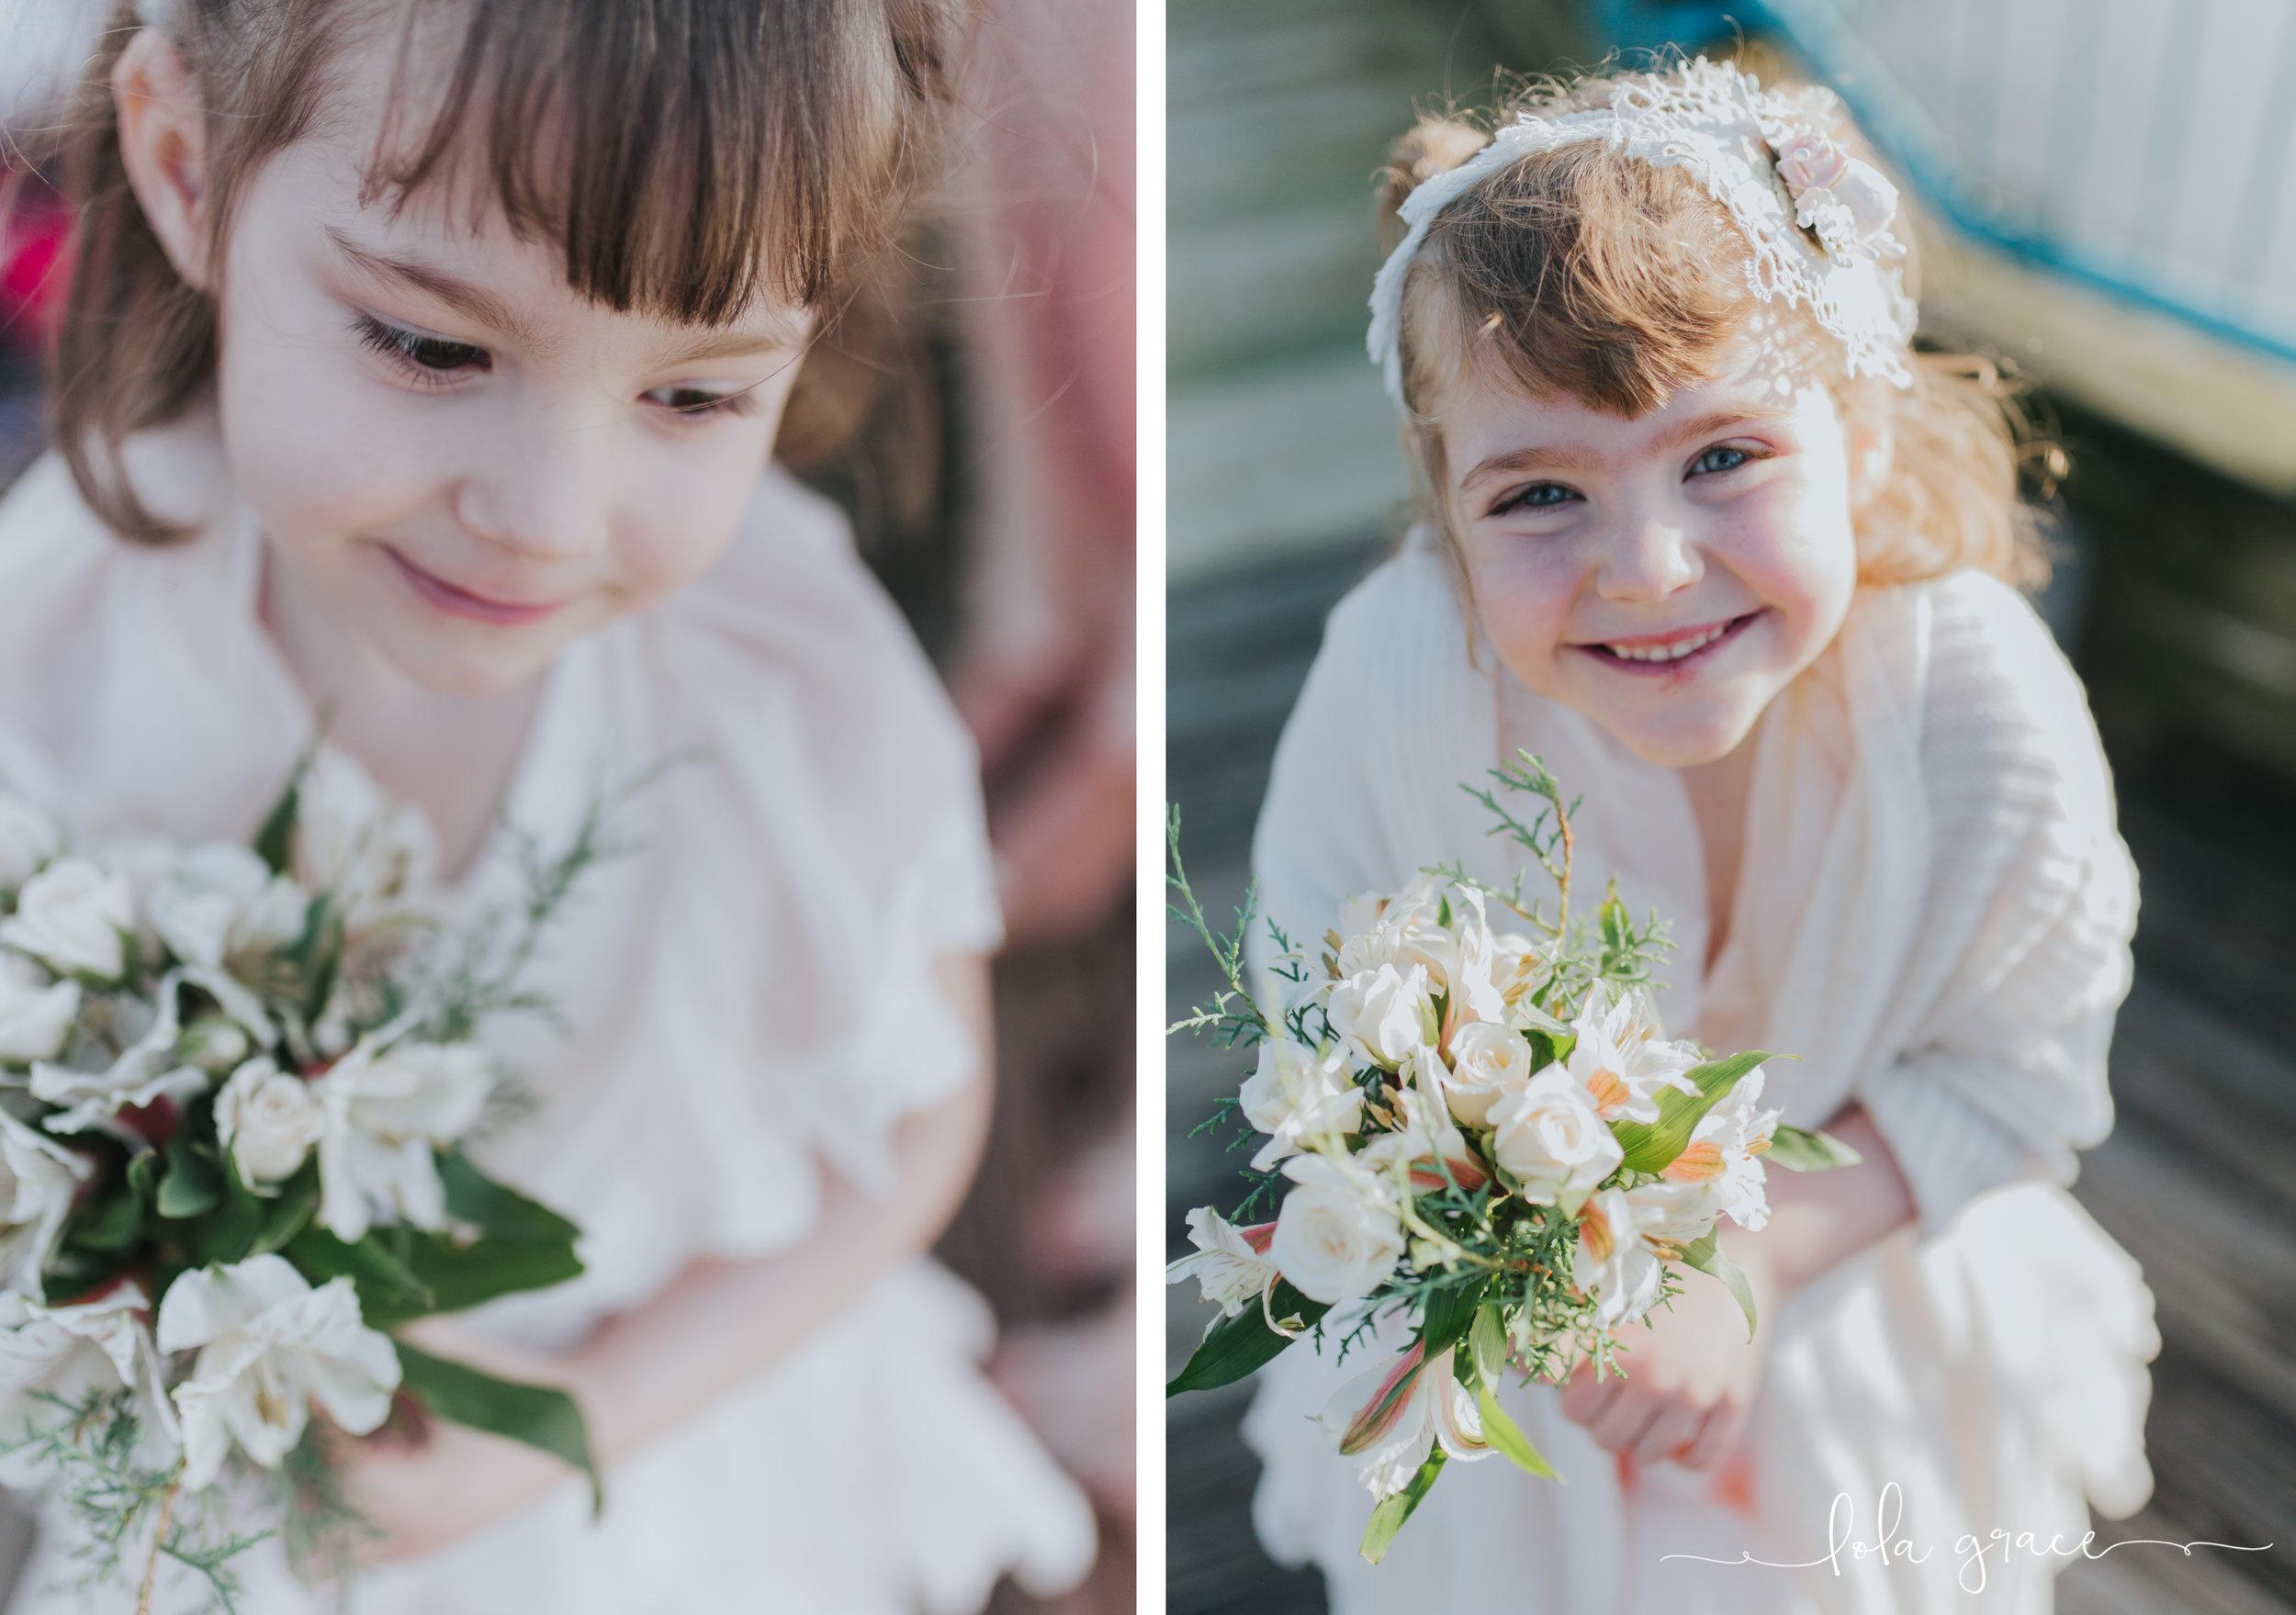 lola-grace-photography-erin-nik-brighton-mi-wedding-9.jpg